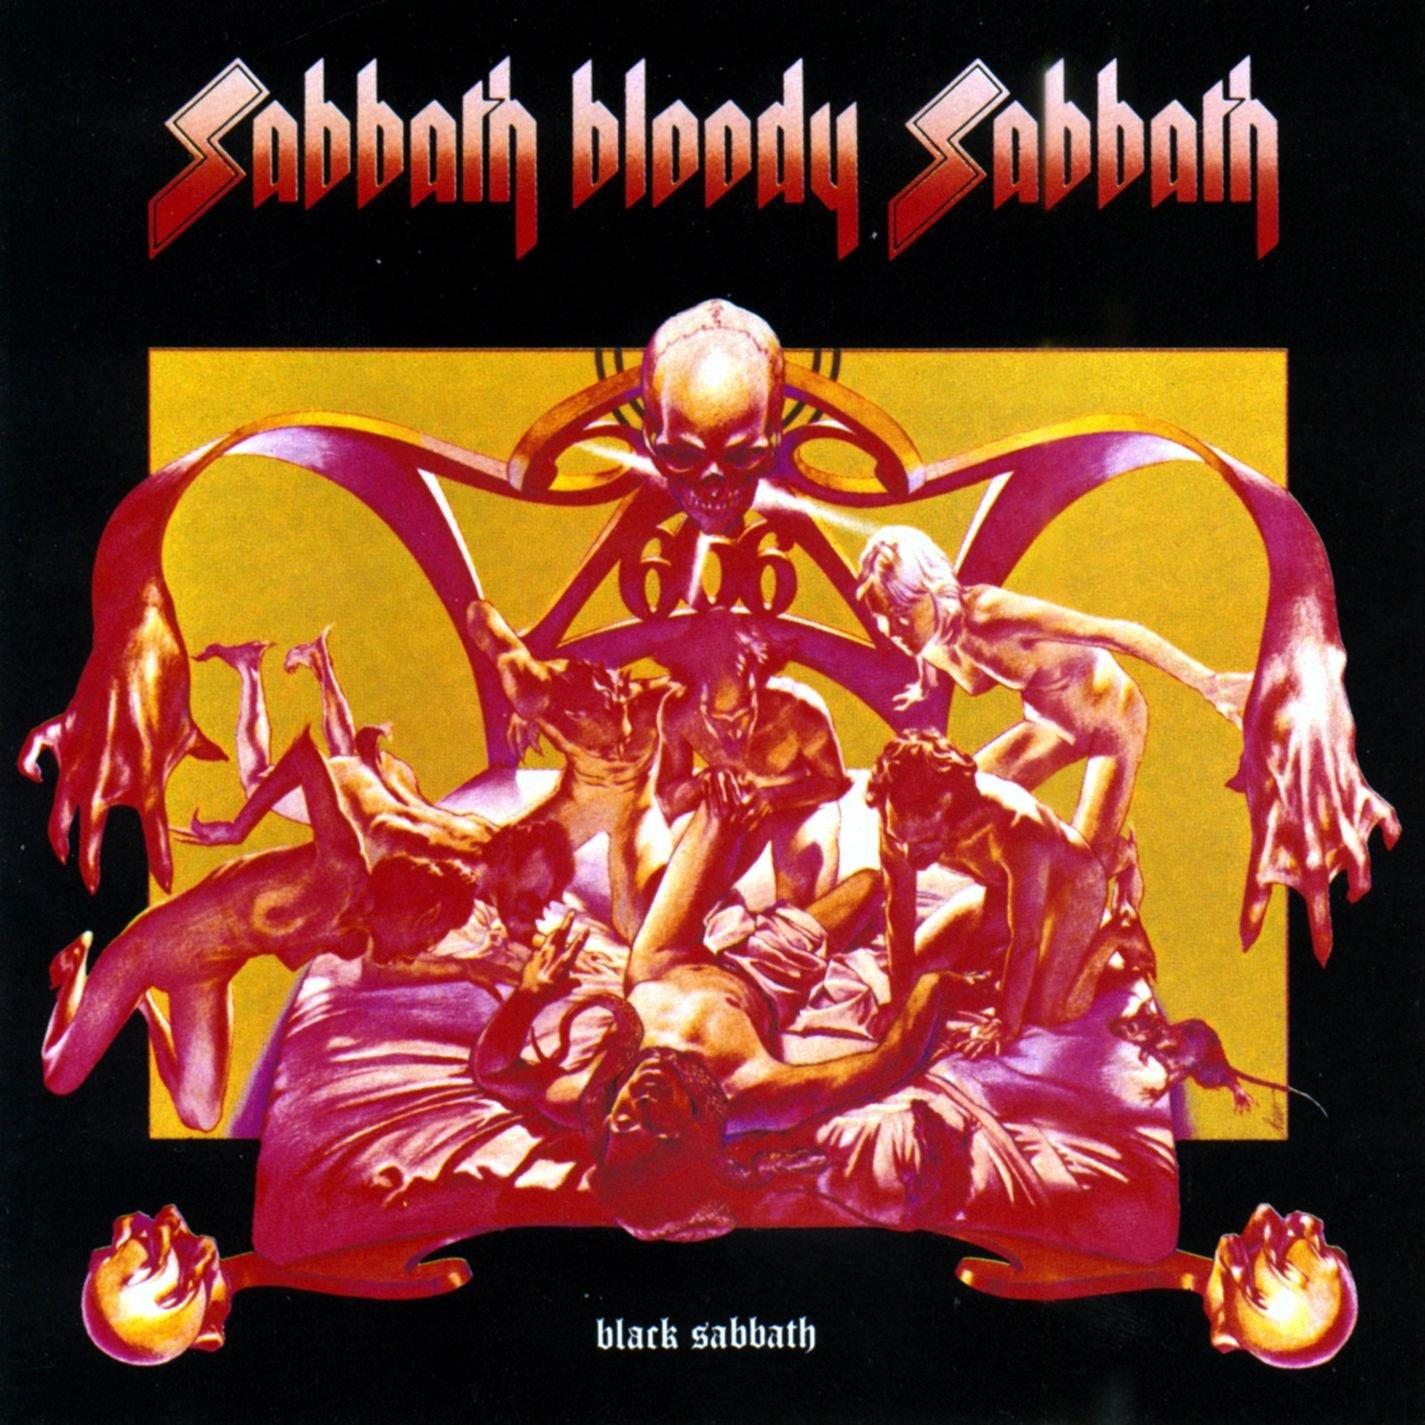 Black Sabbath - Sabbath Bloody Sabbath [LTD LP] (Yellow Vinyl)